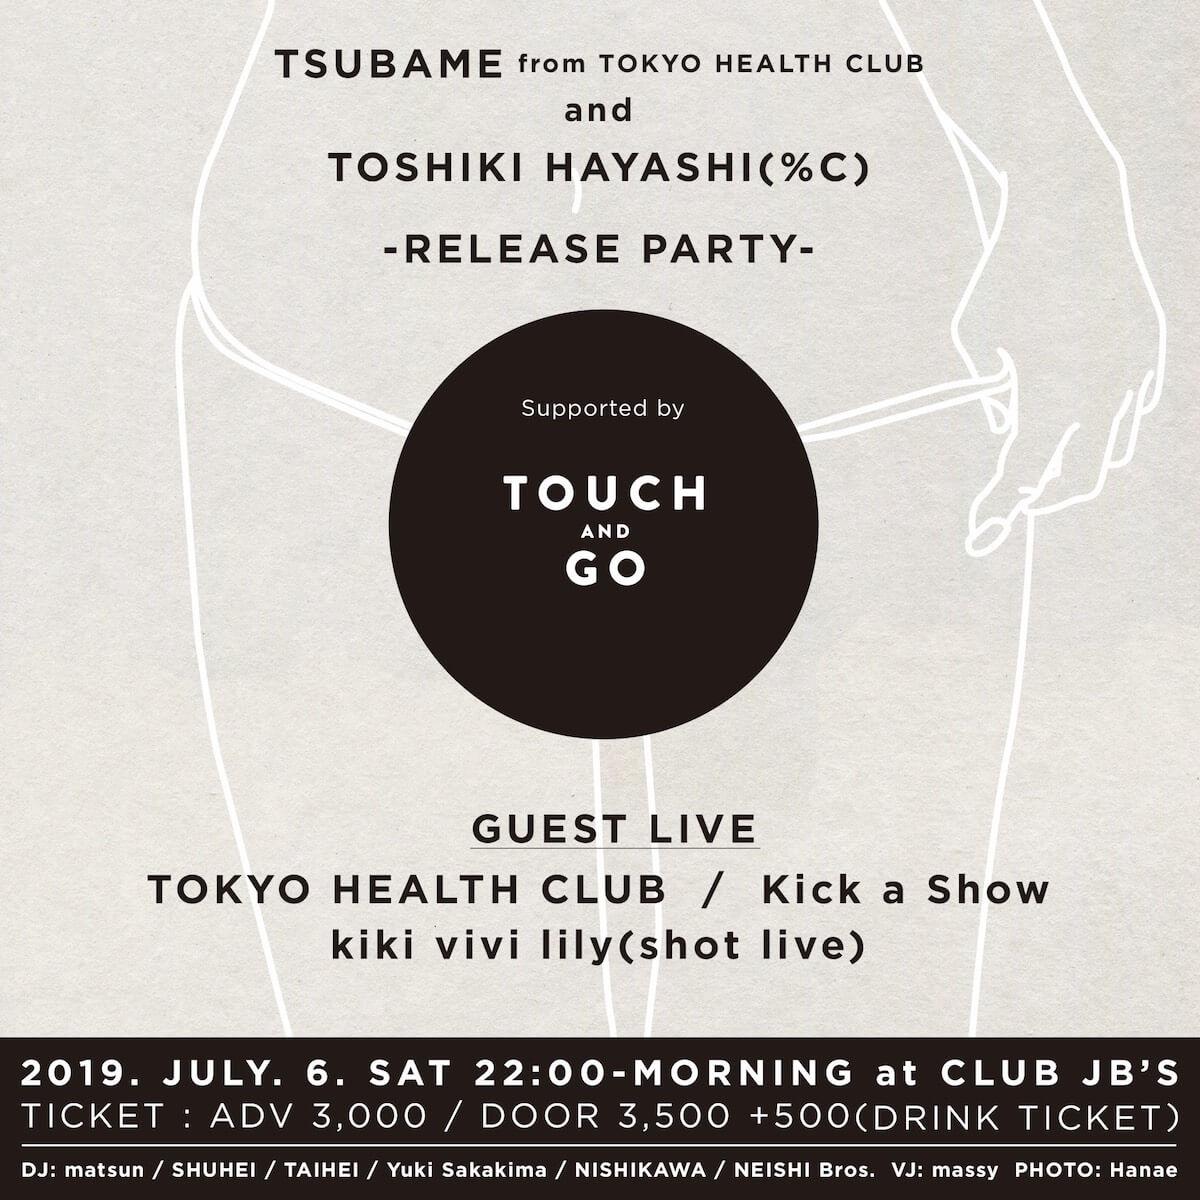 "TOKYO HEALTH CLUBのTSUBAMEが『THE PRESENT』より""SPACE feat. TENDRE""のMVを公開 music190605-tsubame-toshikihayashi-1-1"